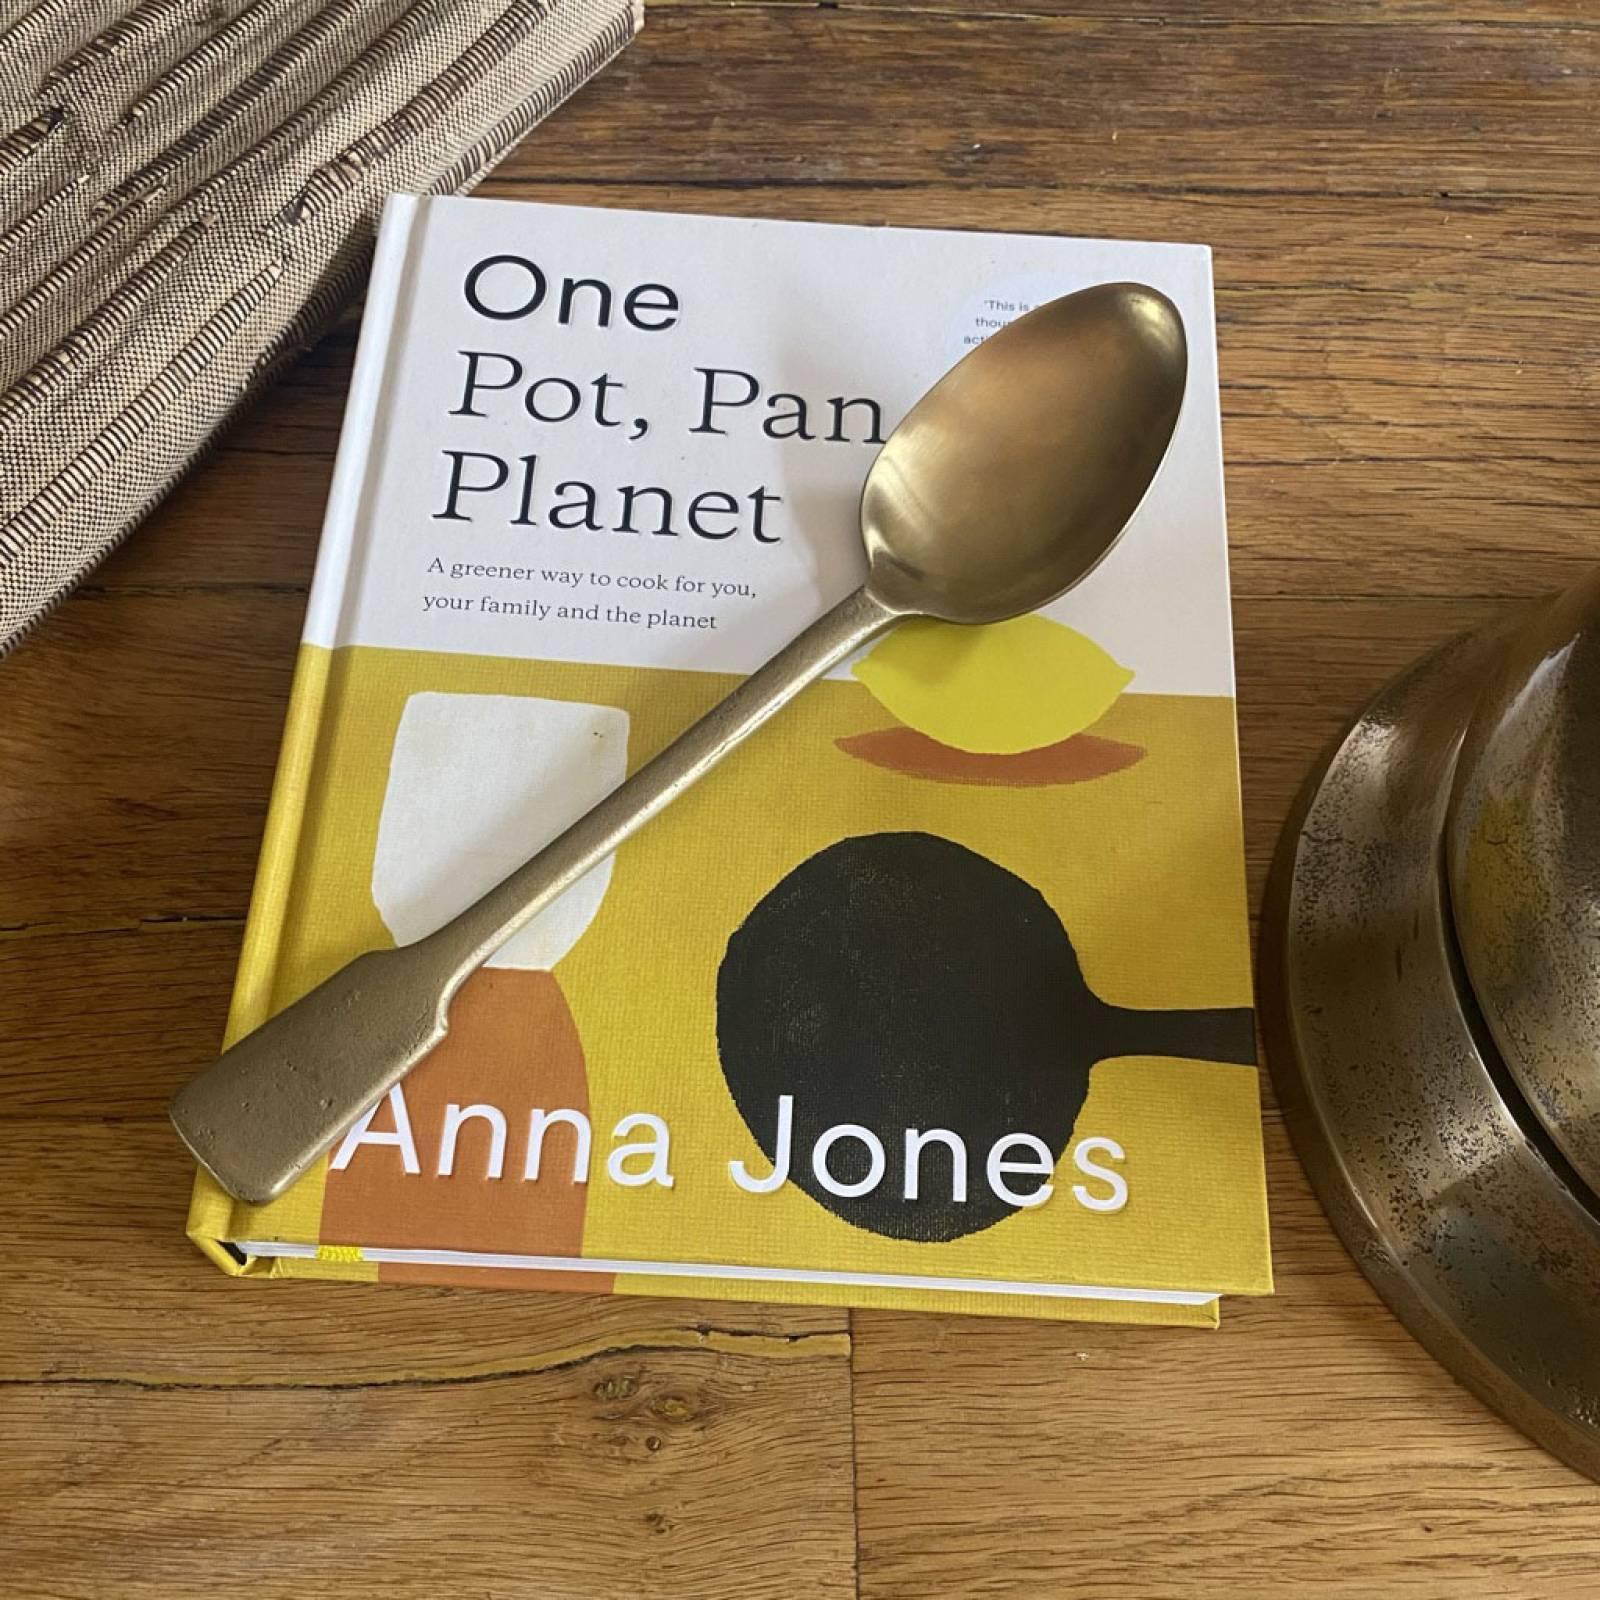 One: Pot, Pan, Planet By Anna Jones - Hardback Book thumbnails